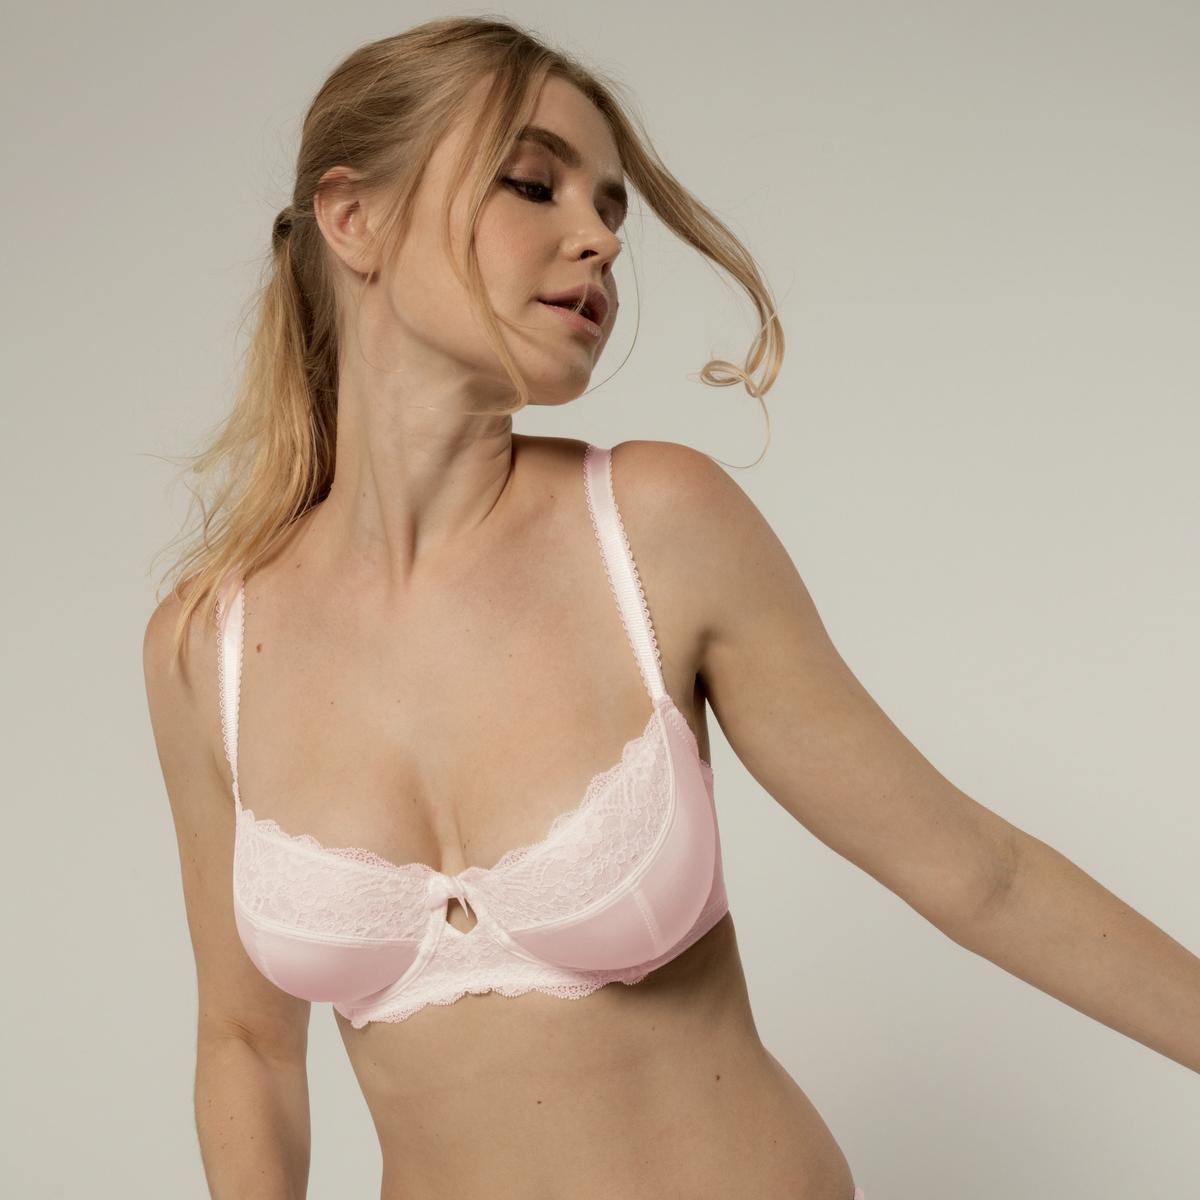 цена Бюстгальтер La Redoute Облегающий Cline D розовый онлайн в 2017 году